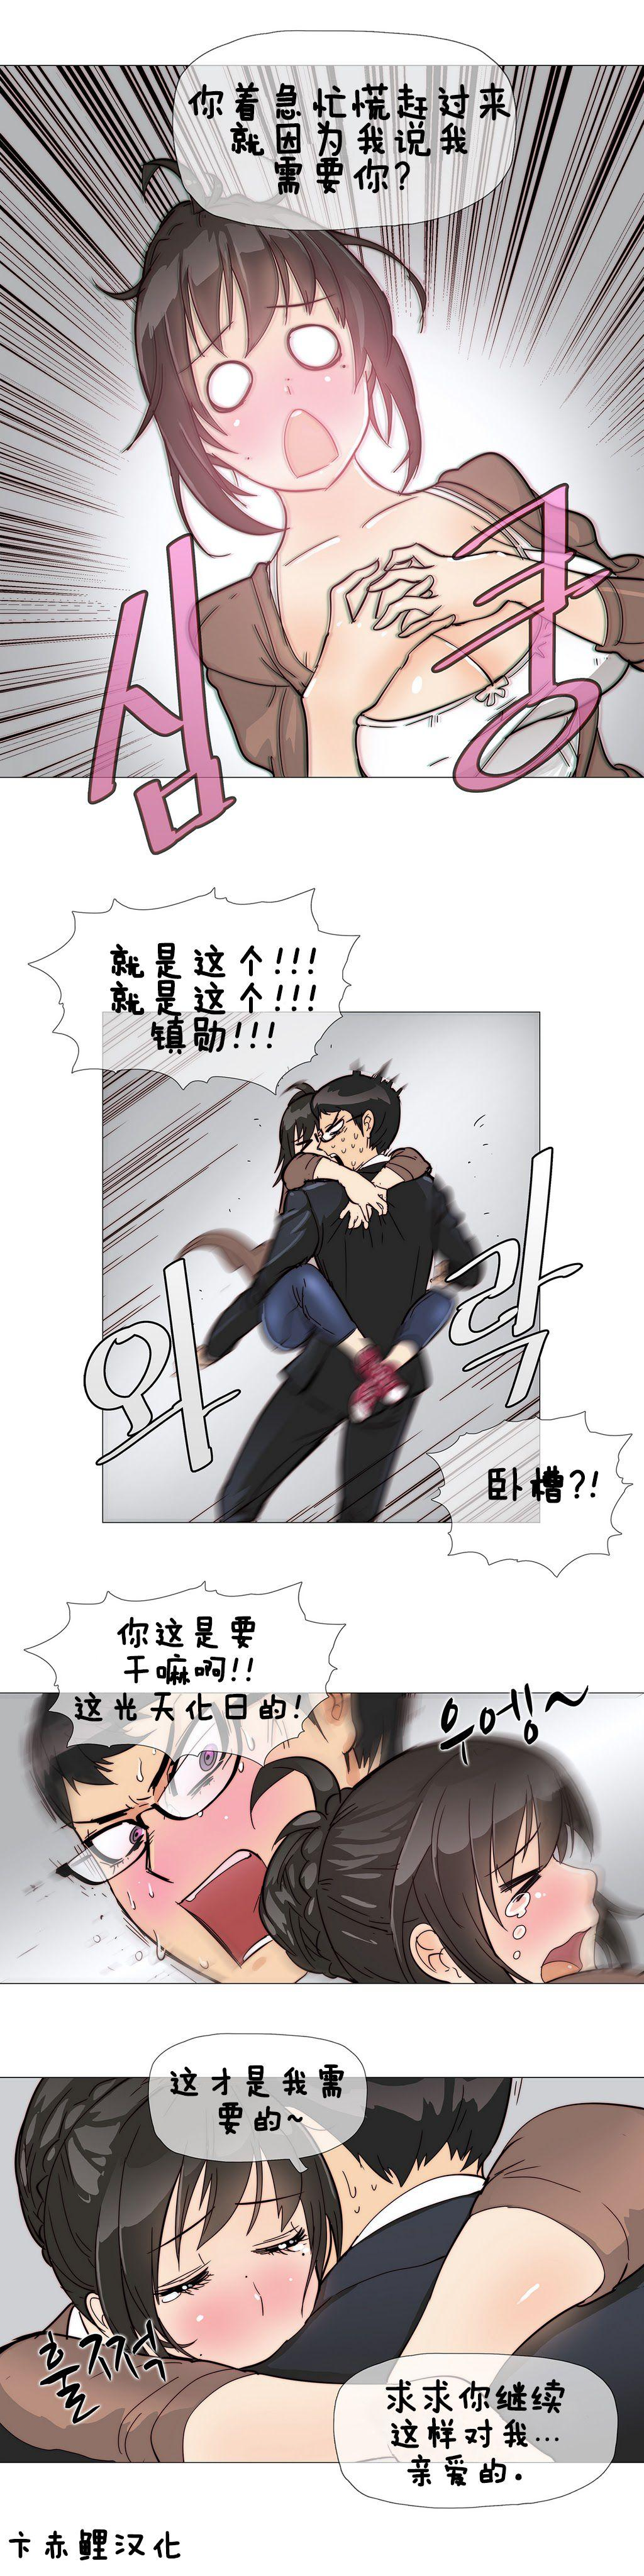 HouseHold Affairs 【卞赤鲤个人汉化】1~33话(持续更新中) 88